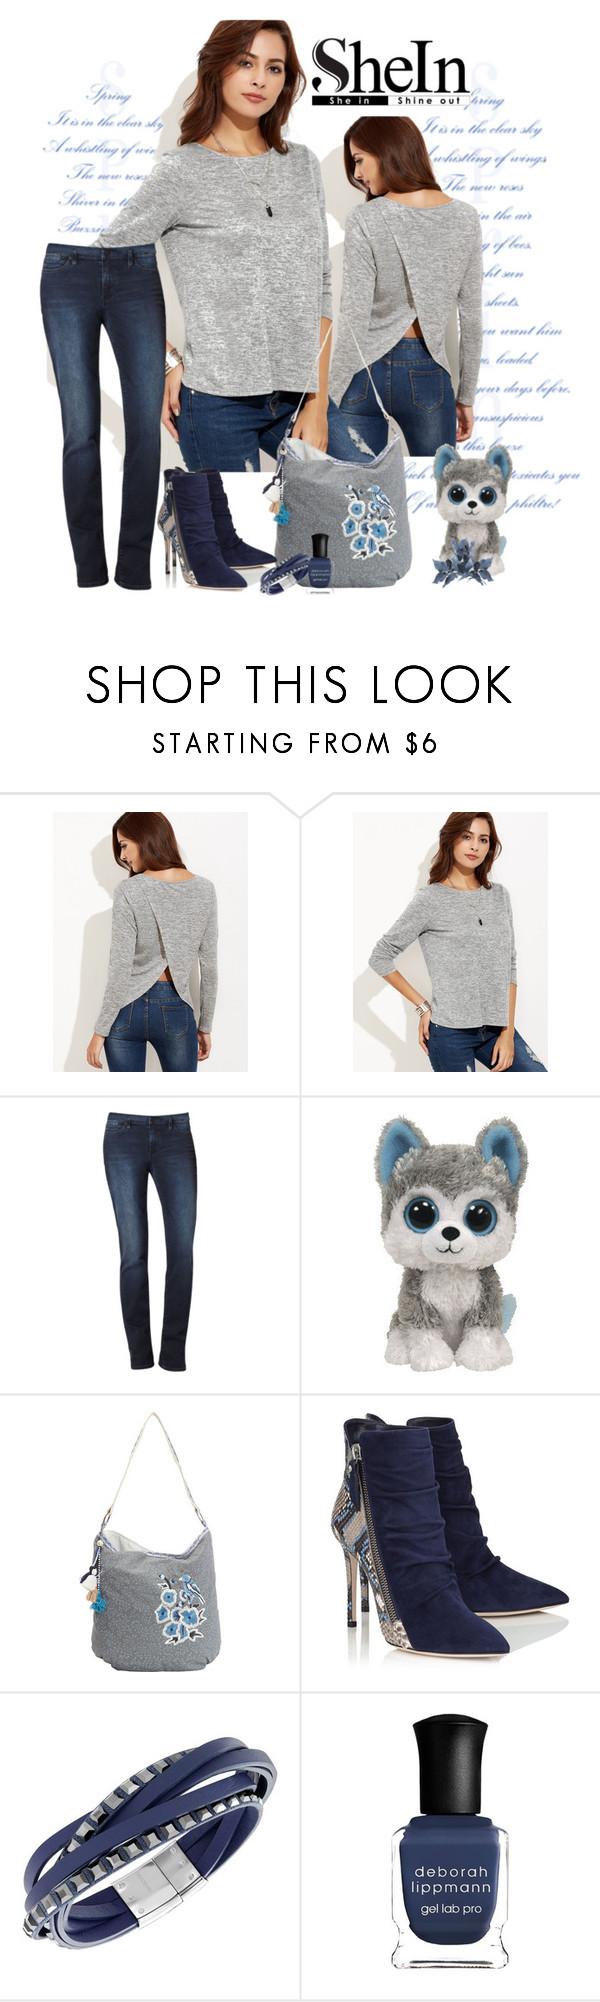 """Shein grey marled knit split back t shirt"" by lorrainekeenan ❤ liked on Polyvore featuring Calvin Klein, Scully, Swarovski and Deborah Lippmann"